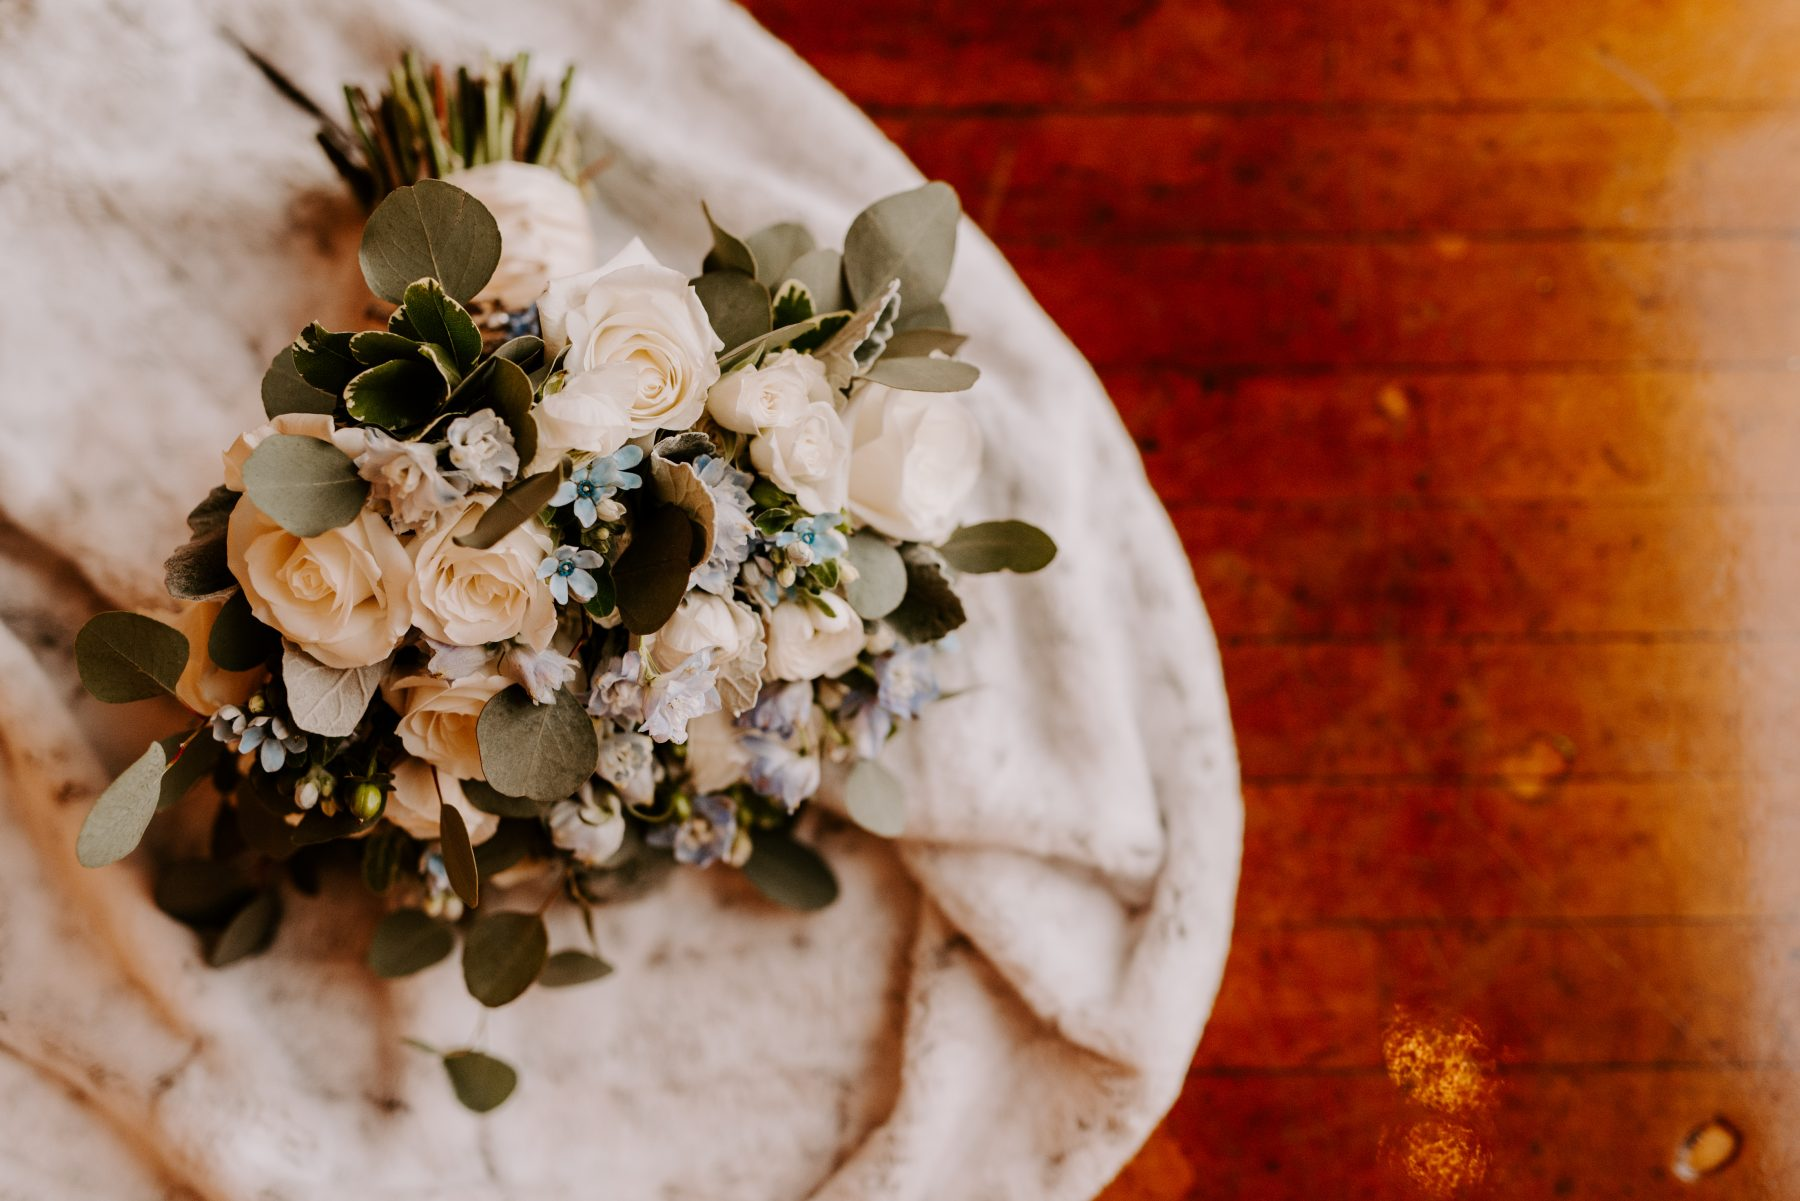 Rhodes on the Pawtuxet Cranston Wedding Ashley and David Blueflash Photography 24